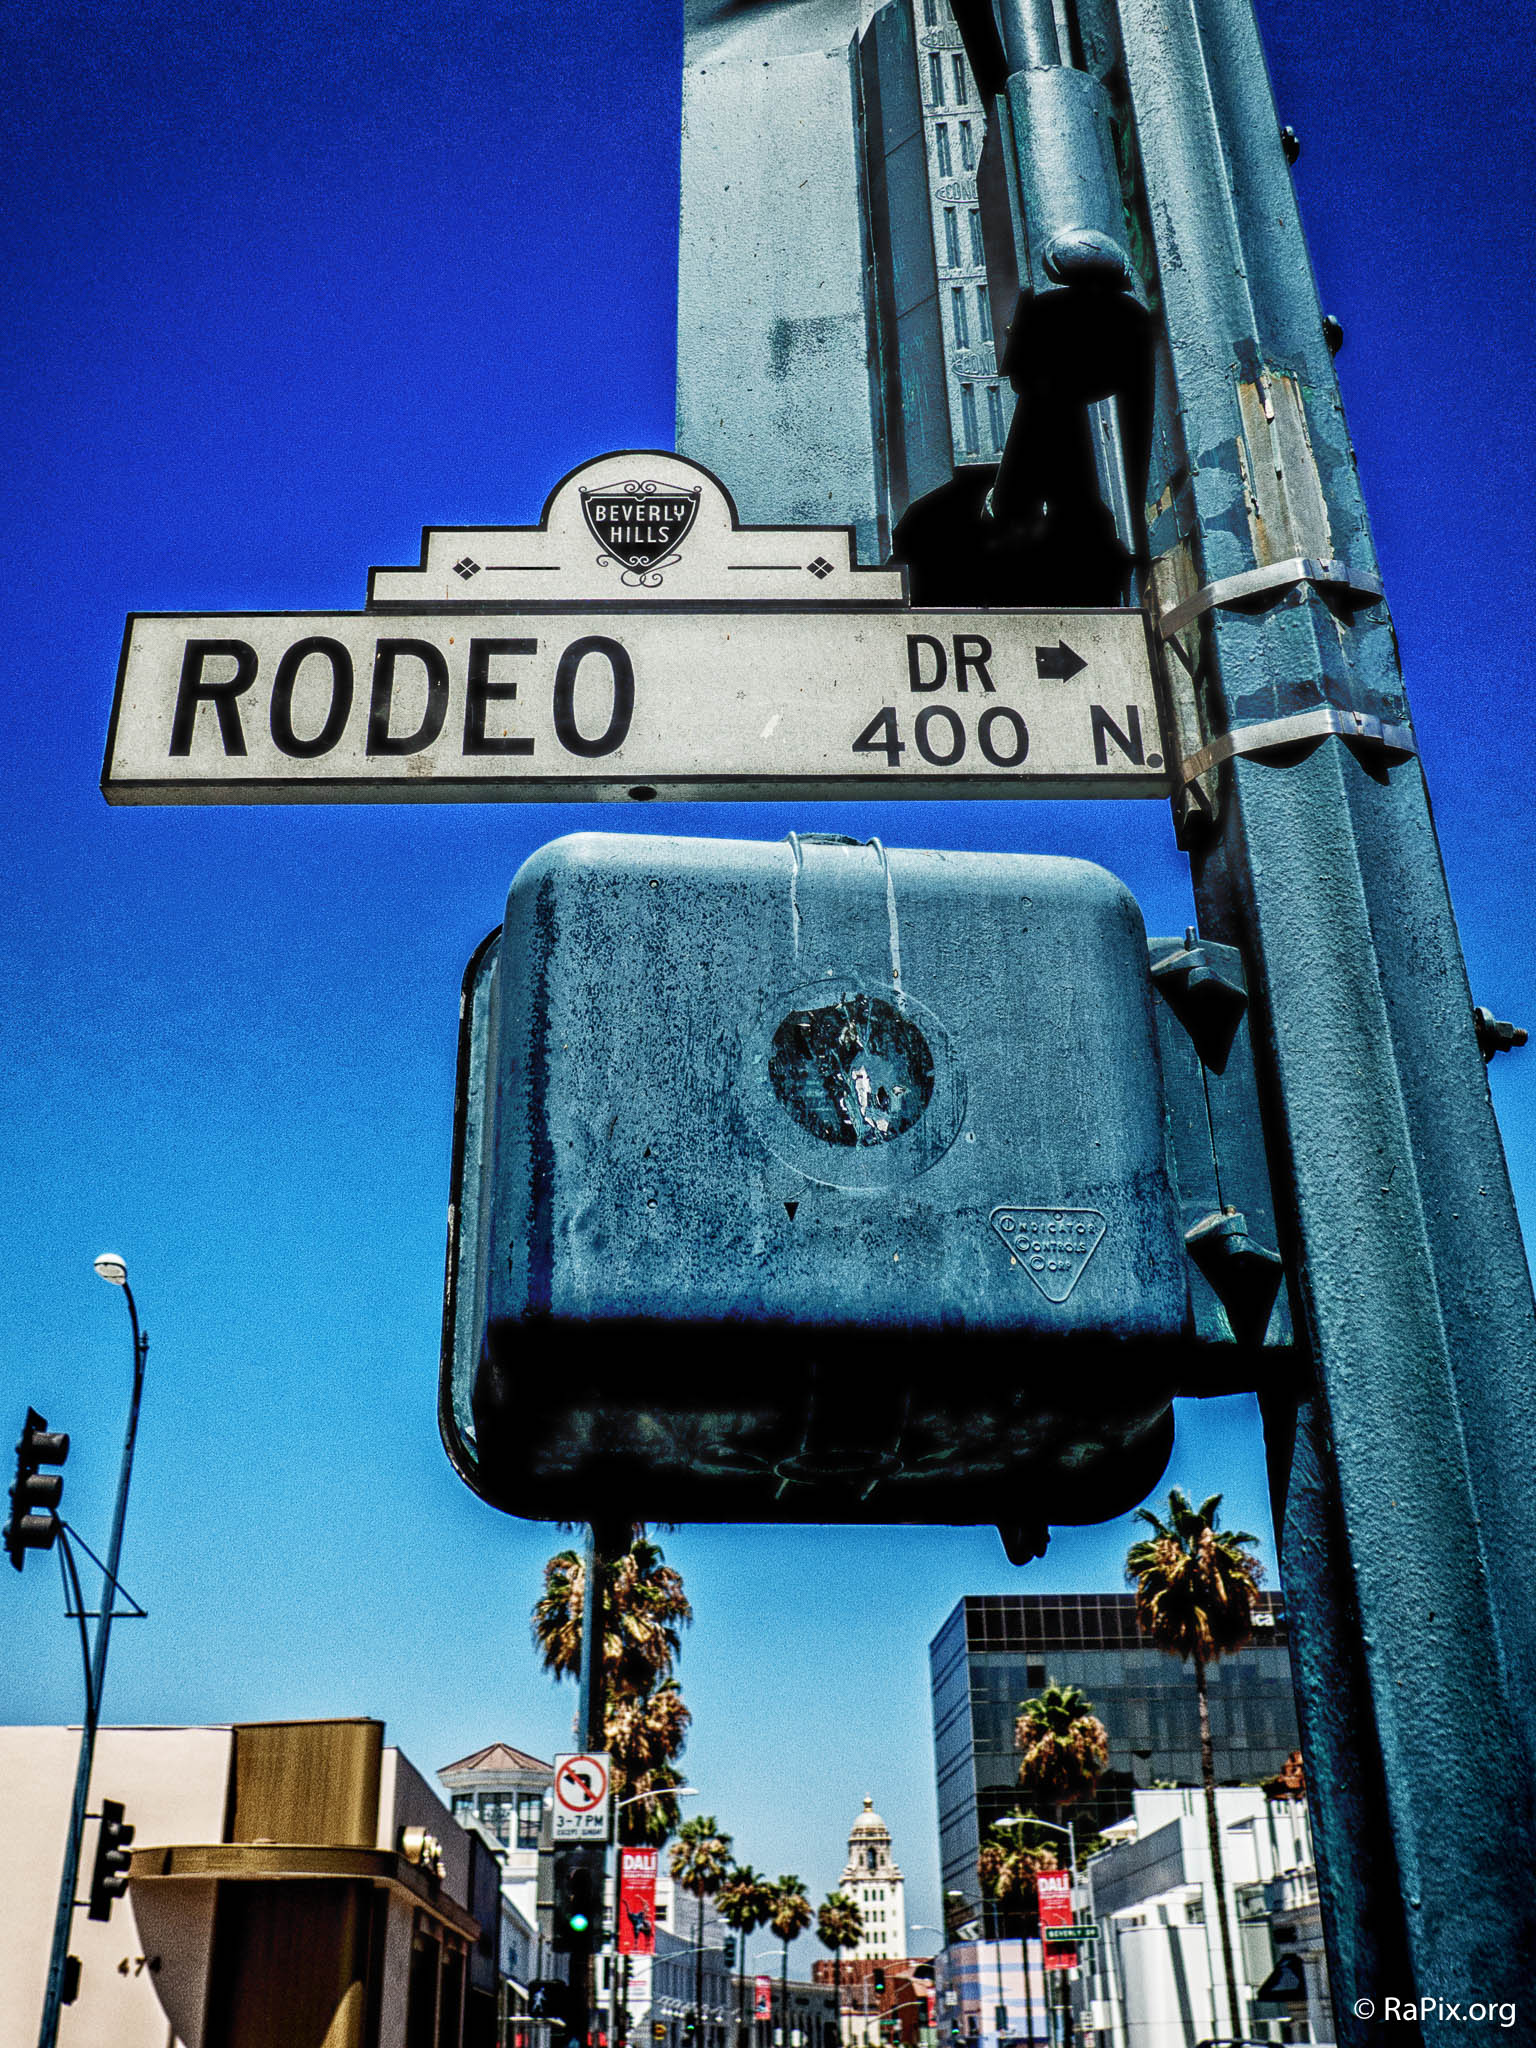 Rodeo (1 of 1).jpg